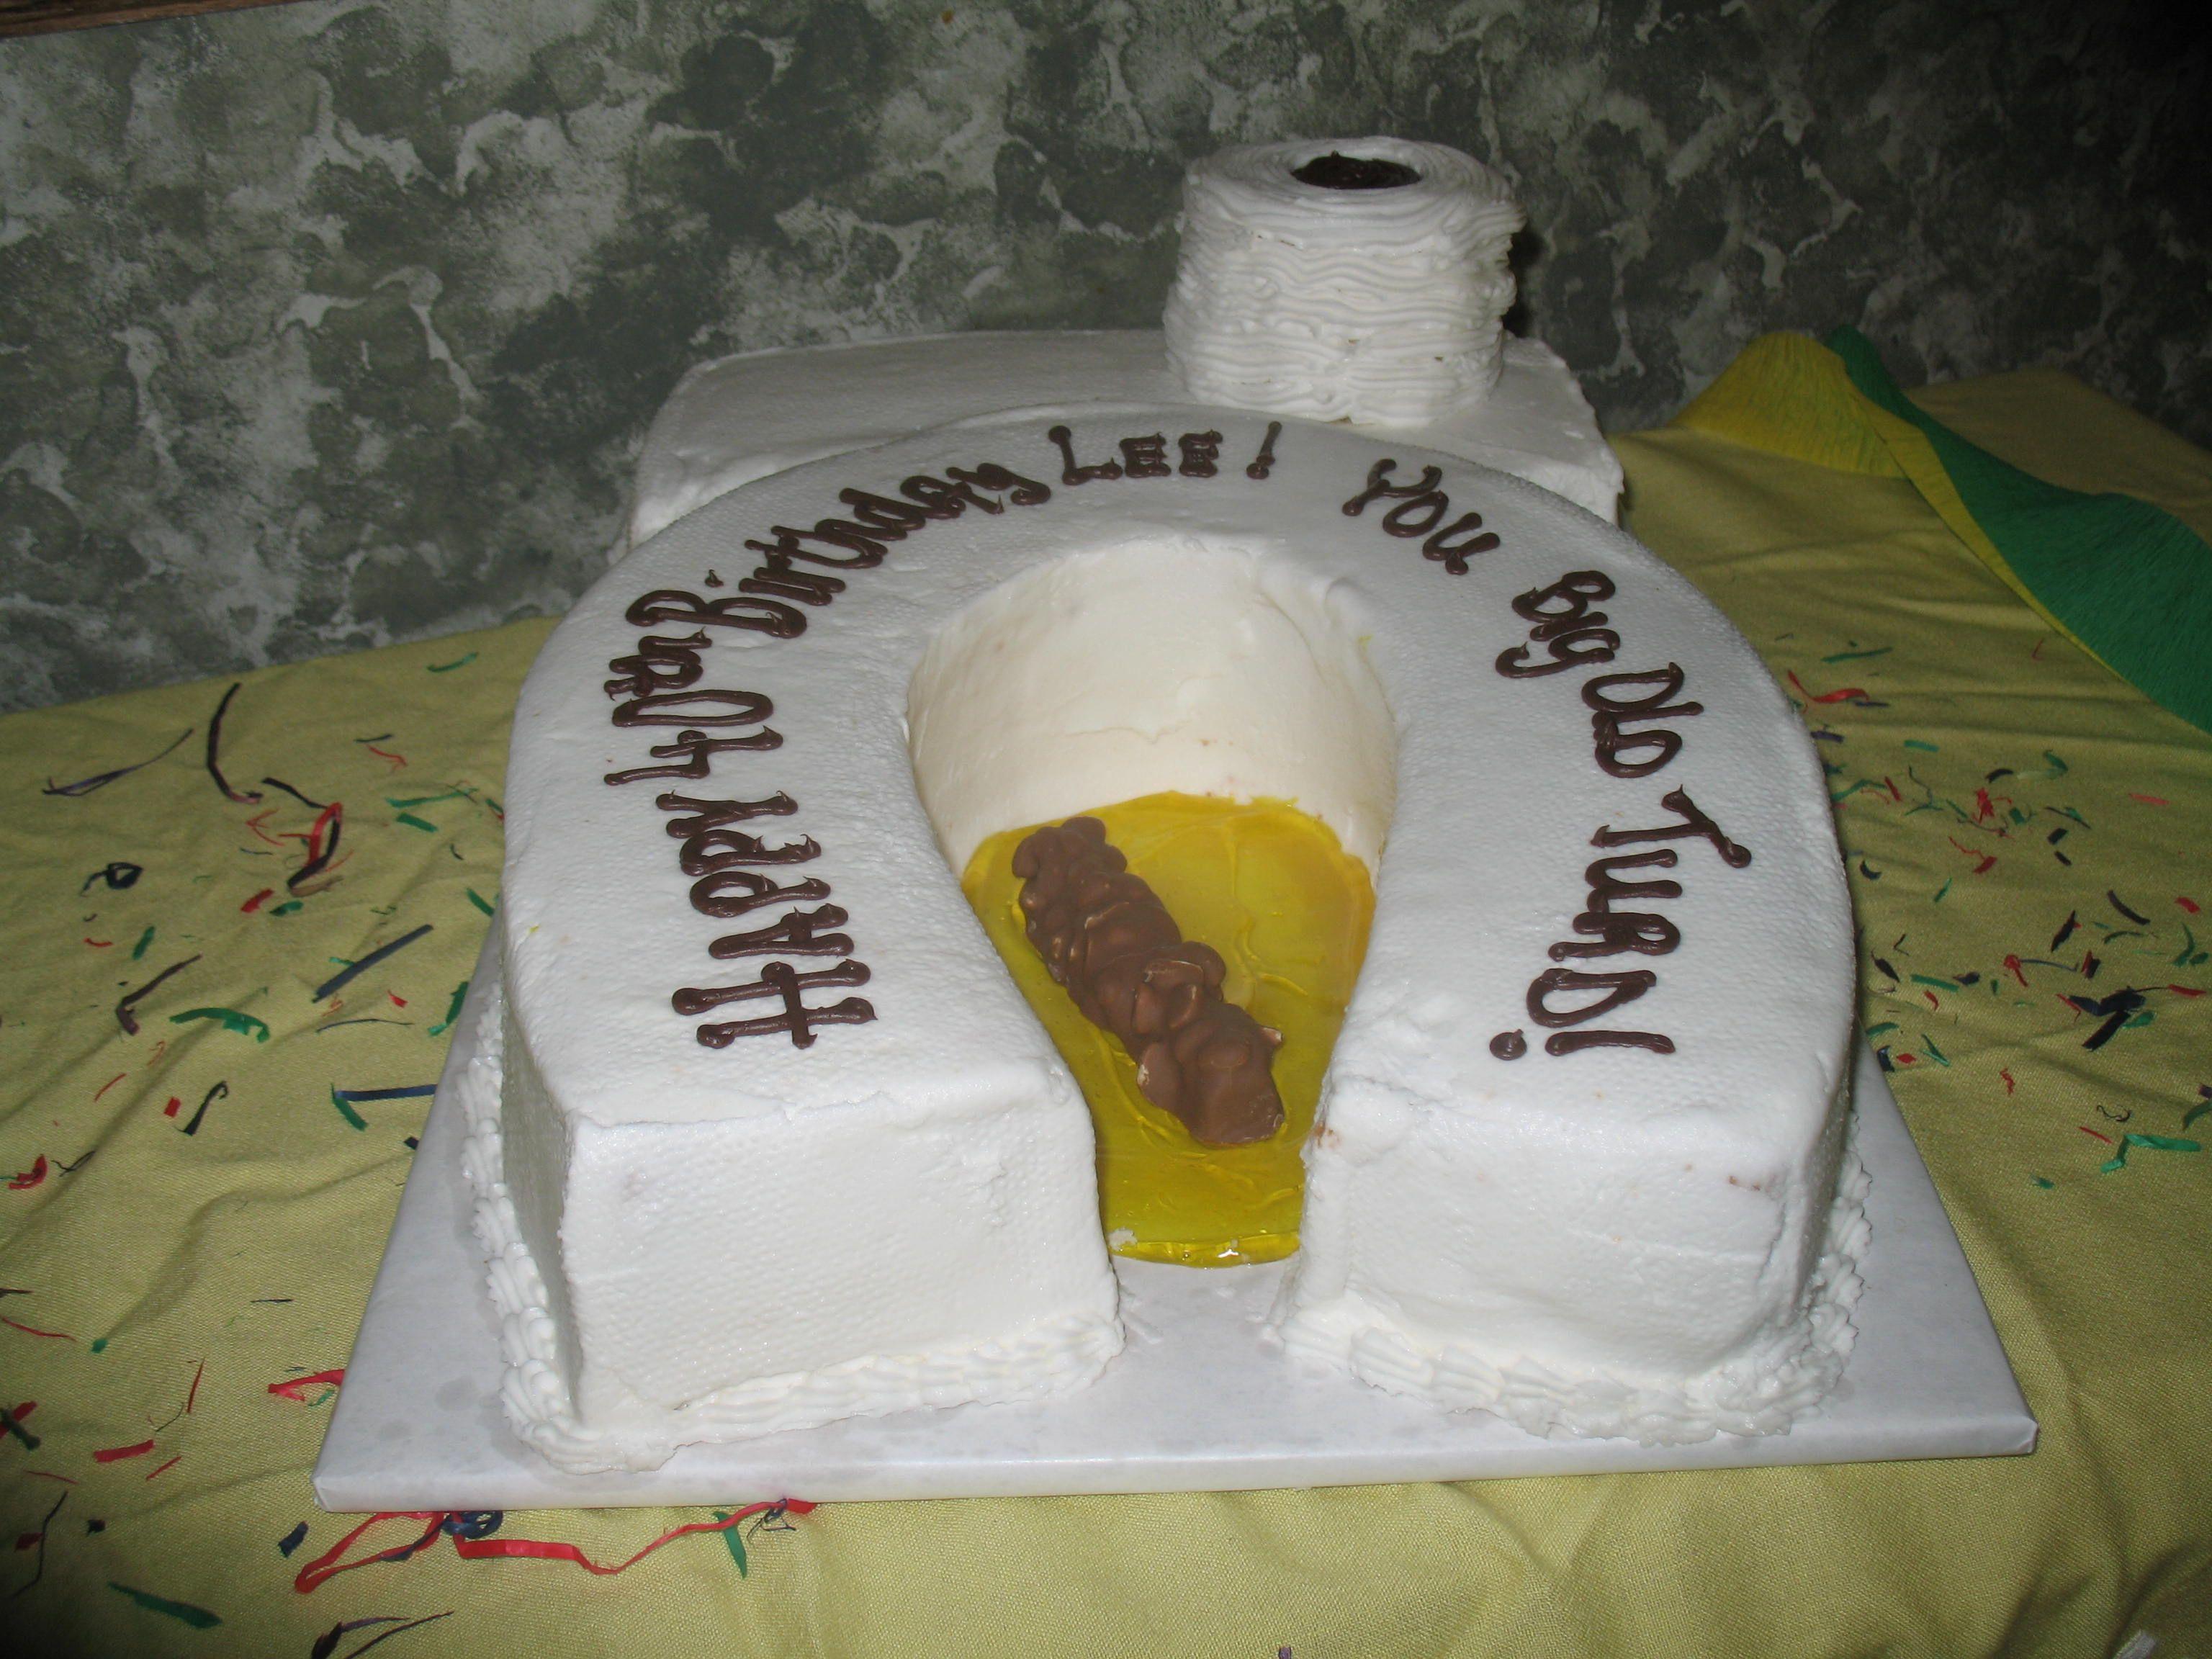 Adult Birthday Cakes cakepinscom Charlie Pinterest Adult